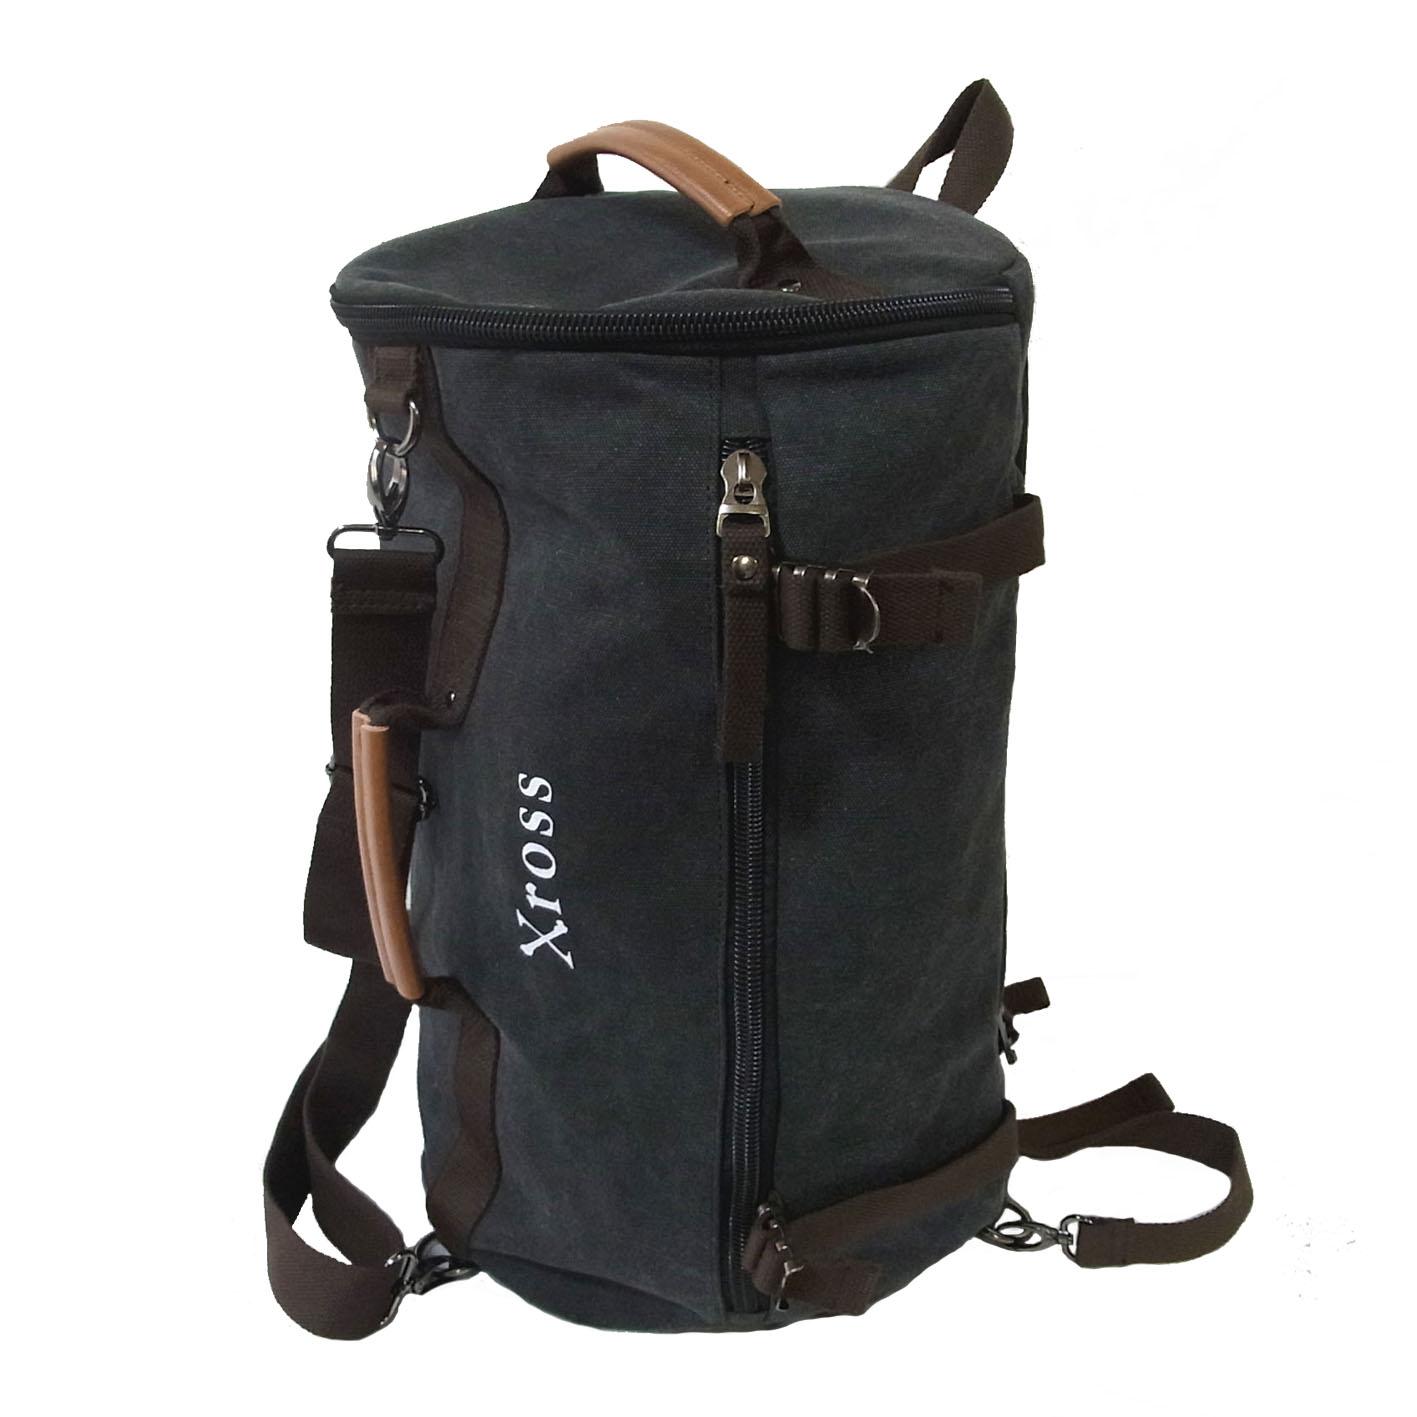 Xross クロス ボストンリュックA バックパック ボストンバッグ キャンバスバッグ